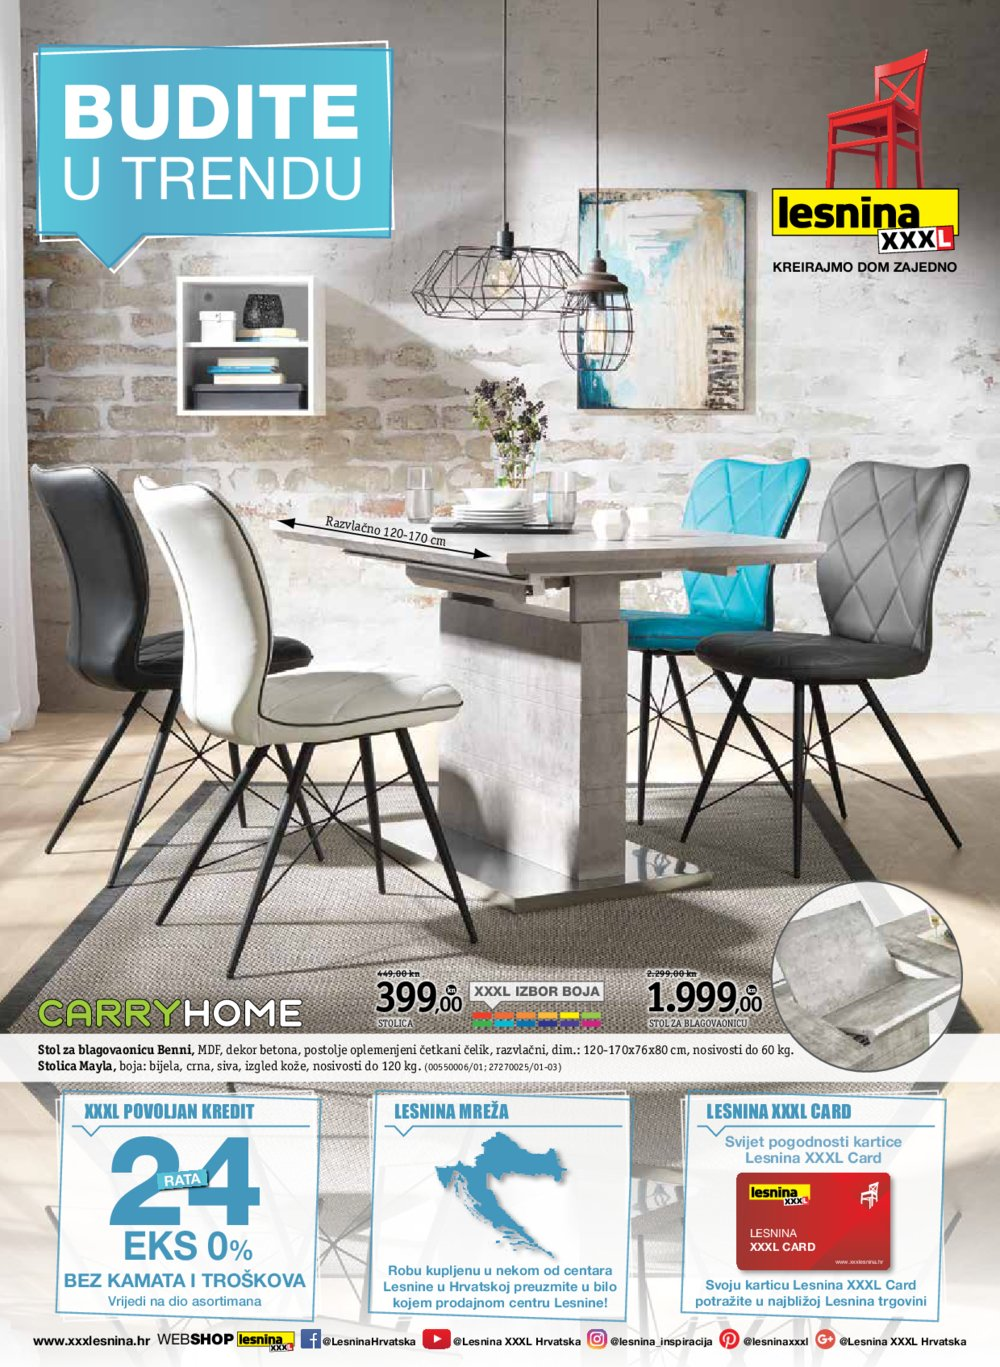 Lesnina katalog Budite u trendu 06.03.-19.03.2018.